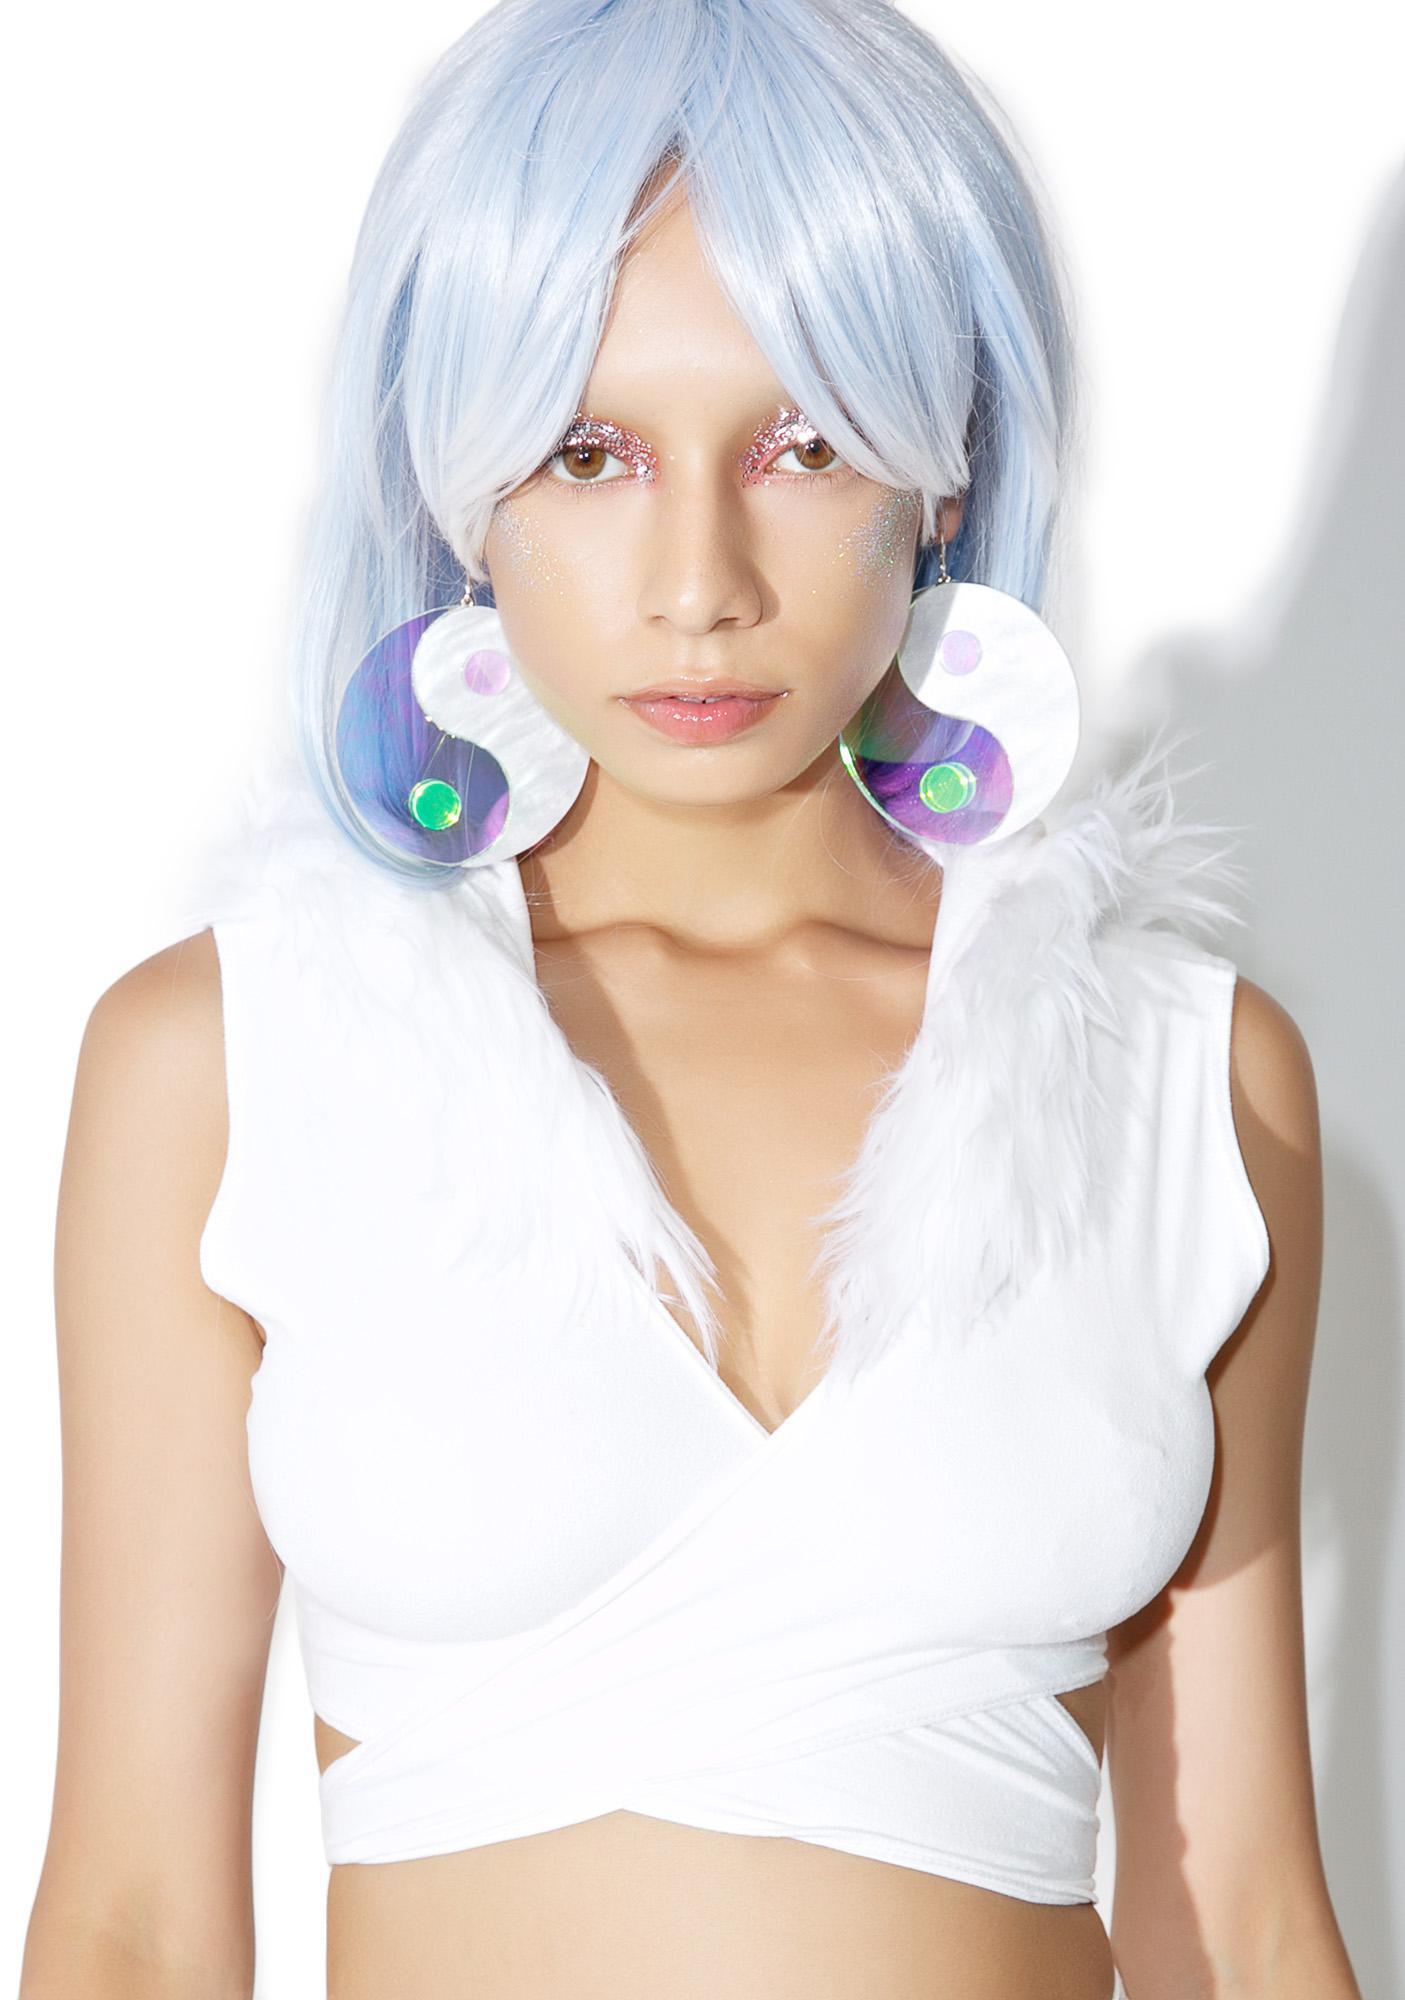 Marina Fini Yin Yang Earrings